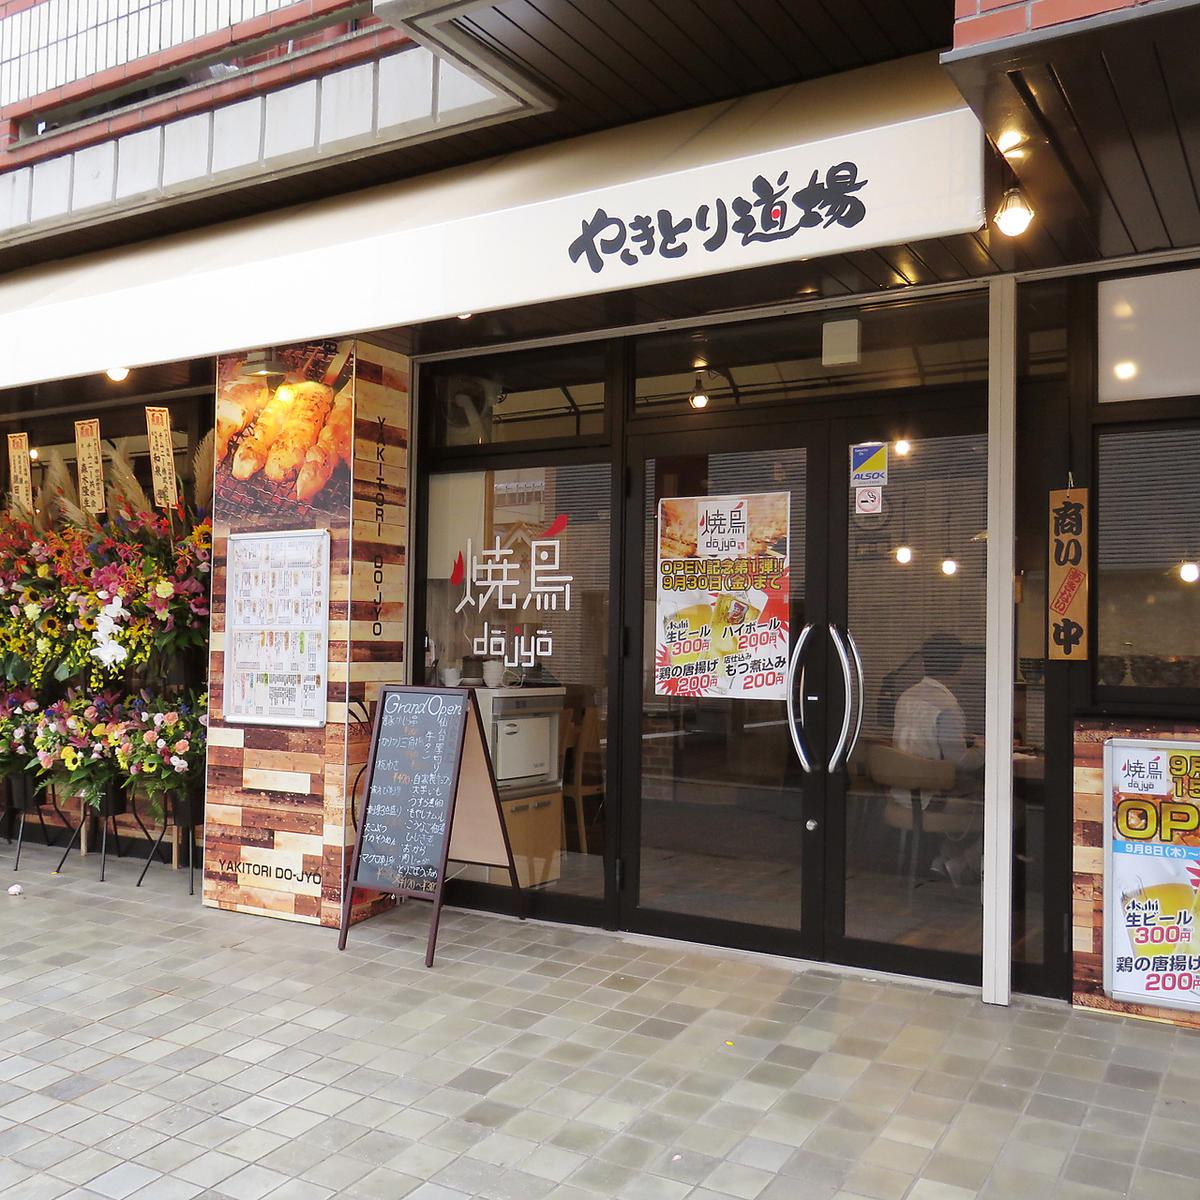 It is stylish inside and outside like a thought like a yakitori san?